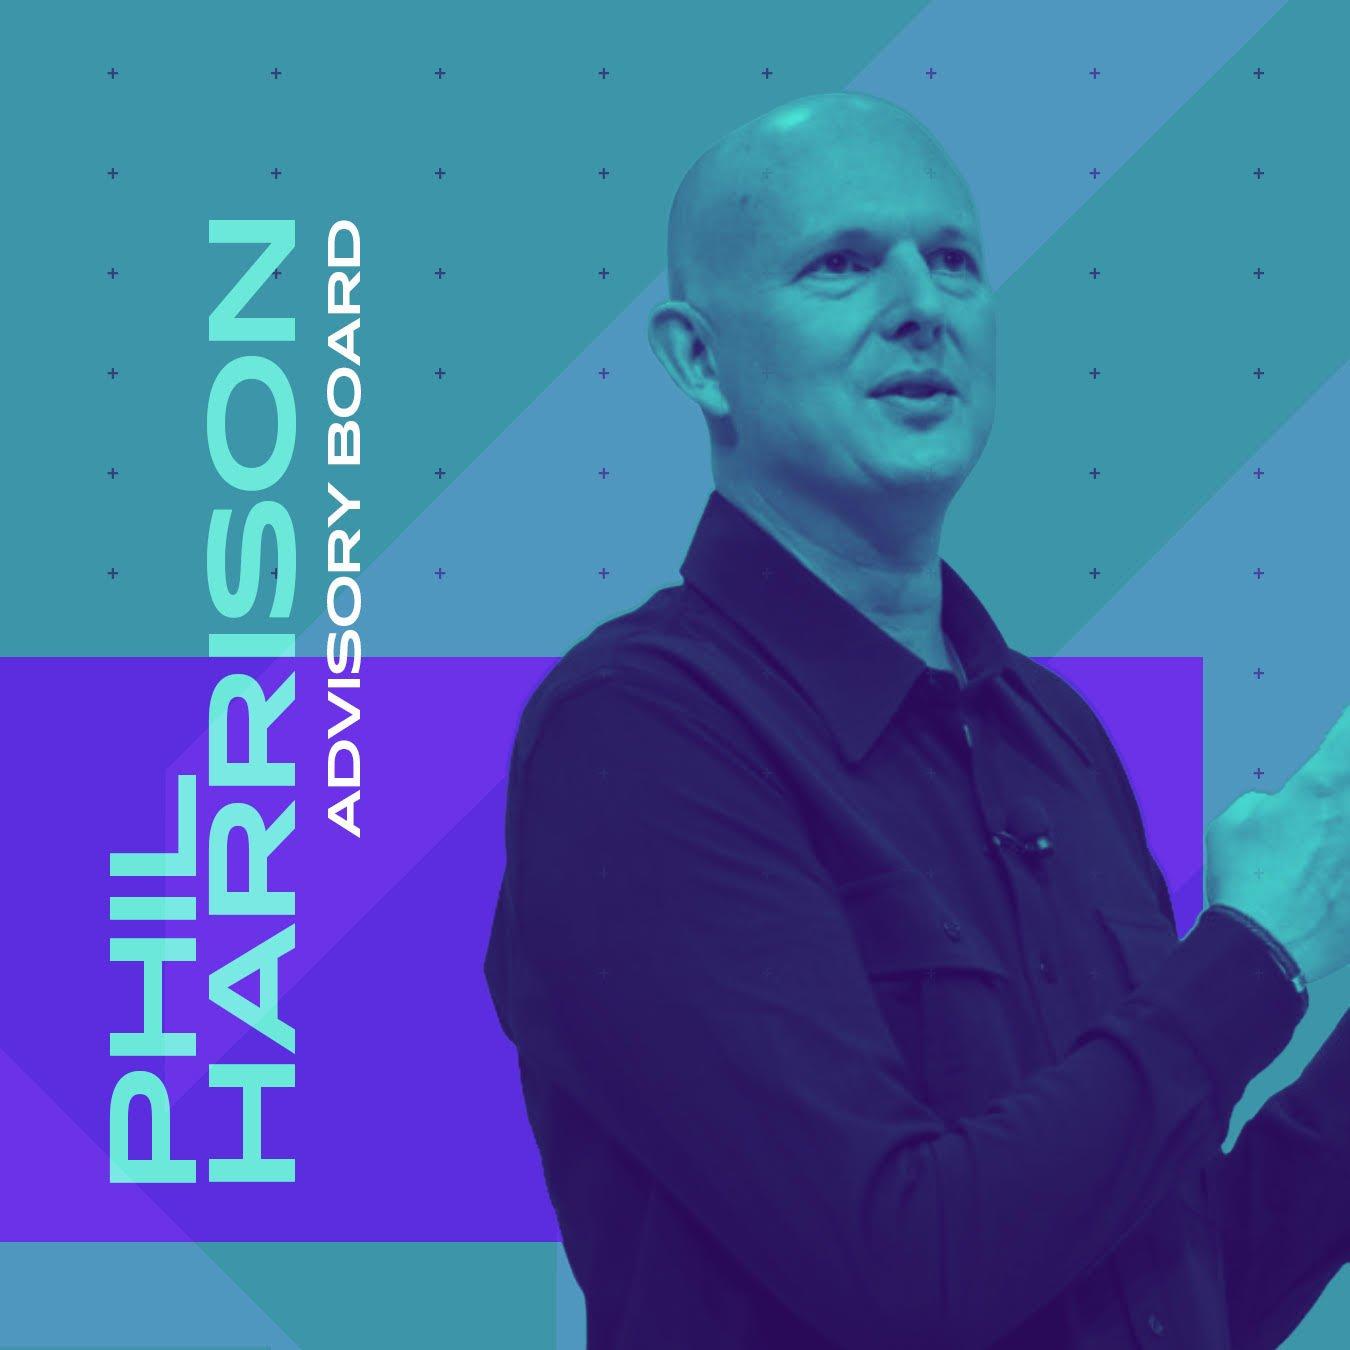 Phil Harrison of Google